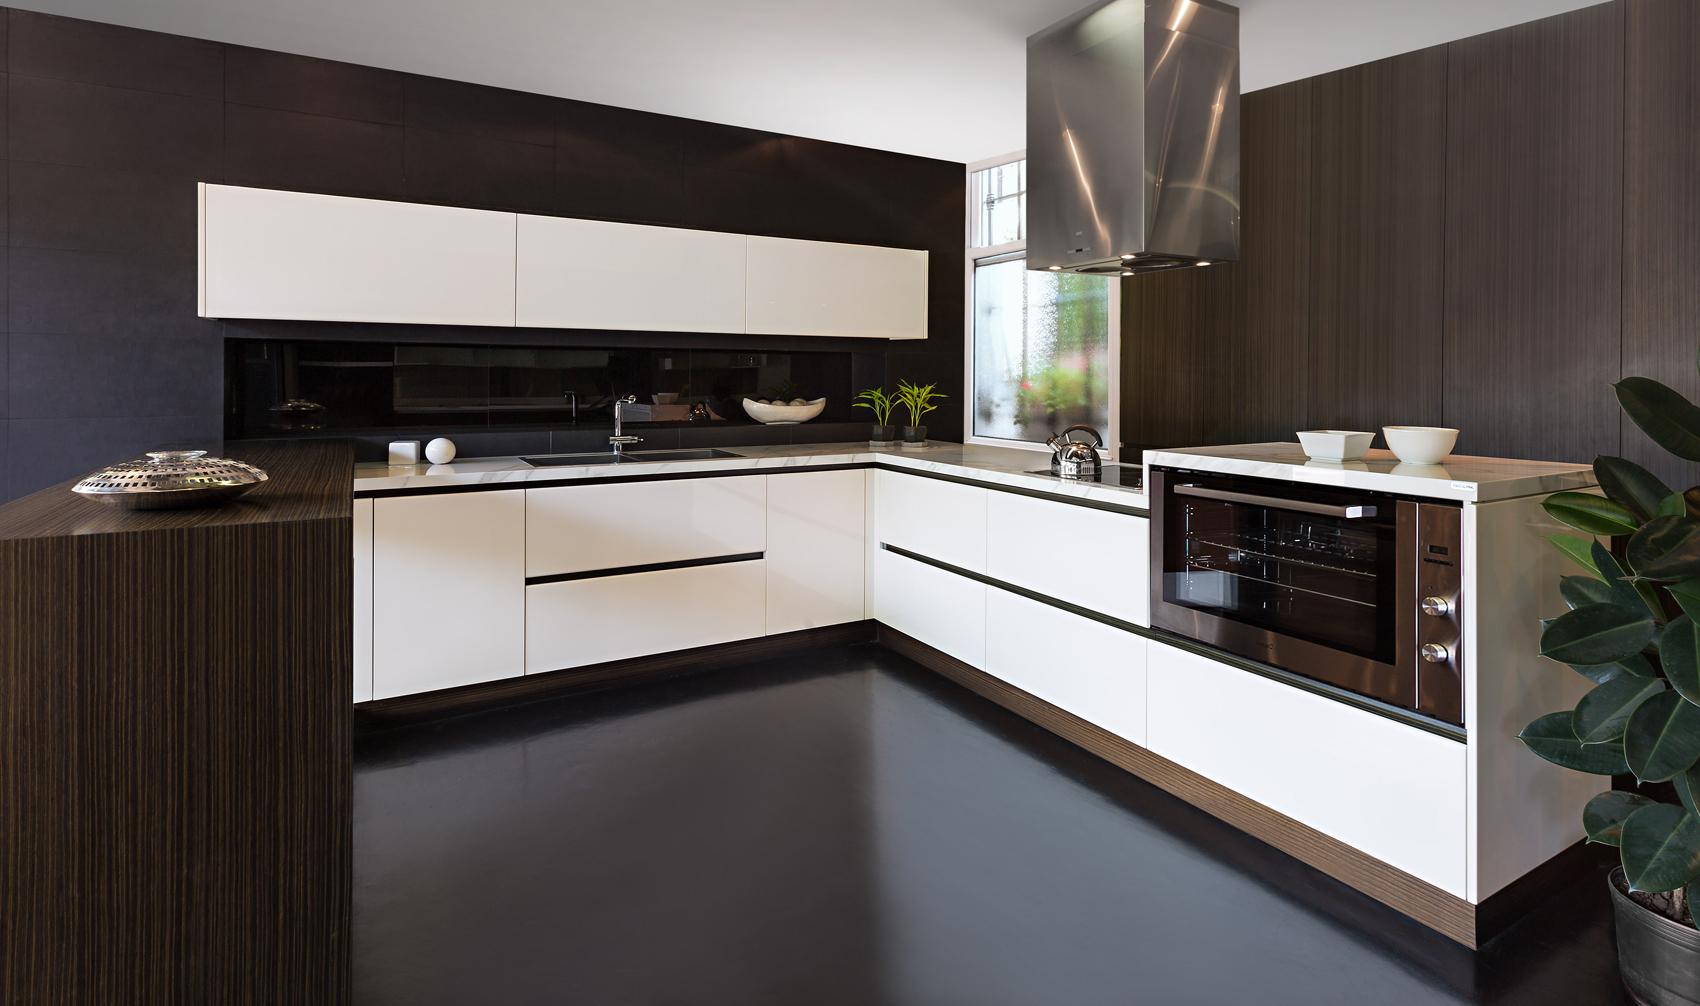 Domi cocinas modelos de cocina for Cocinas modelos